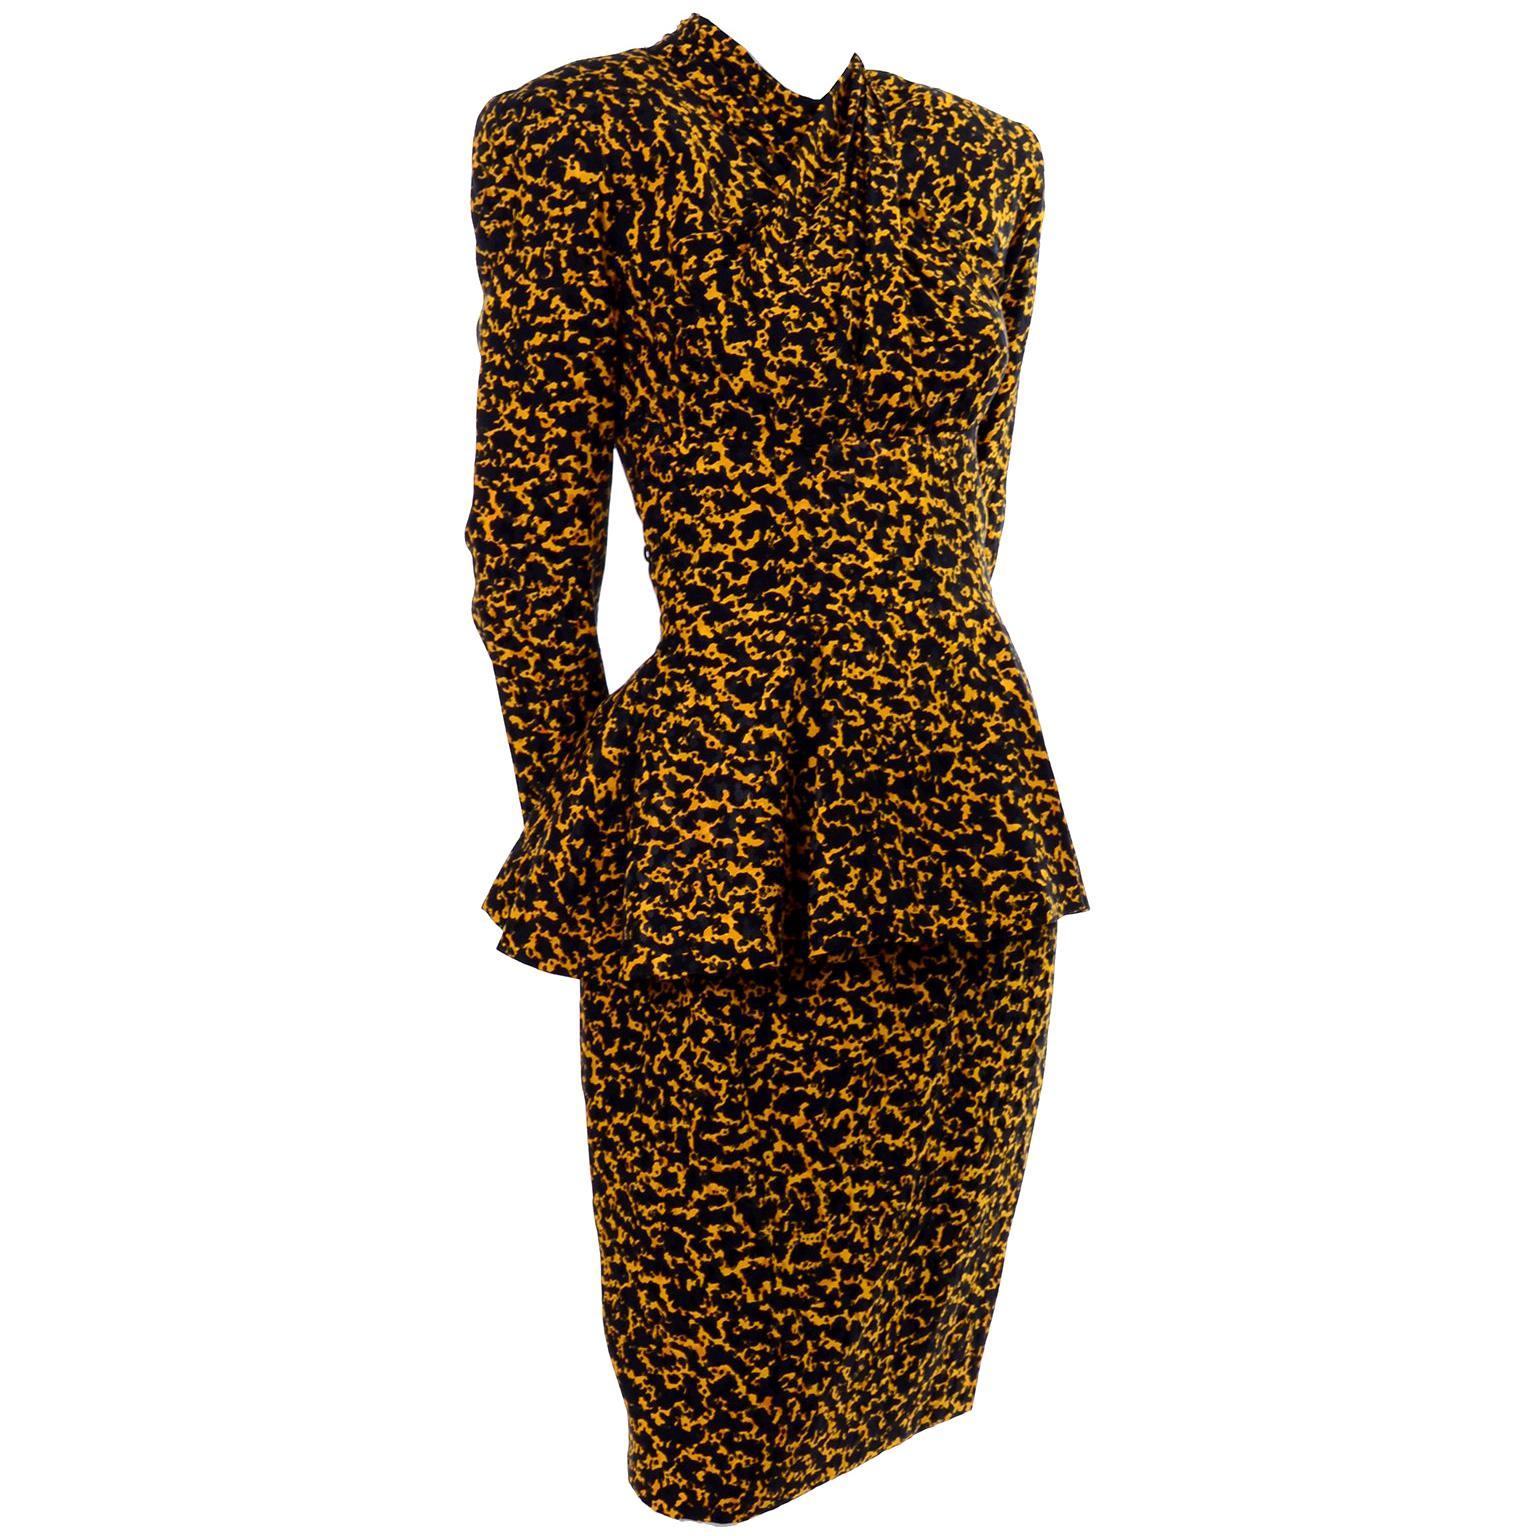 Vicky Tiel Peplum Top & Skirt Dress / Suit in Yellow & Black Abstract Silk Print